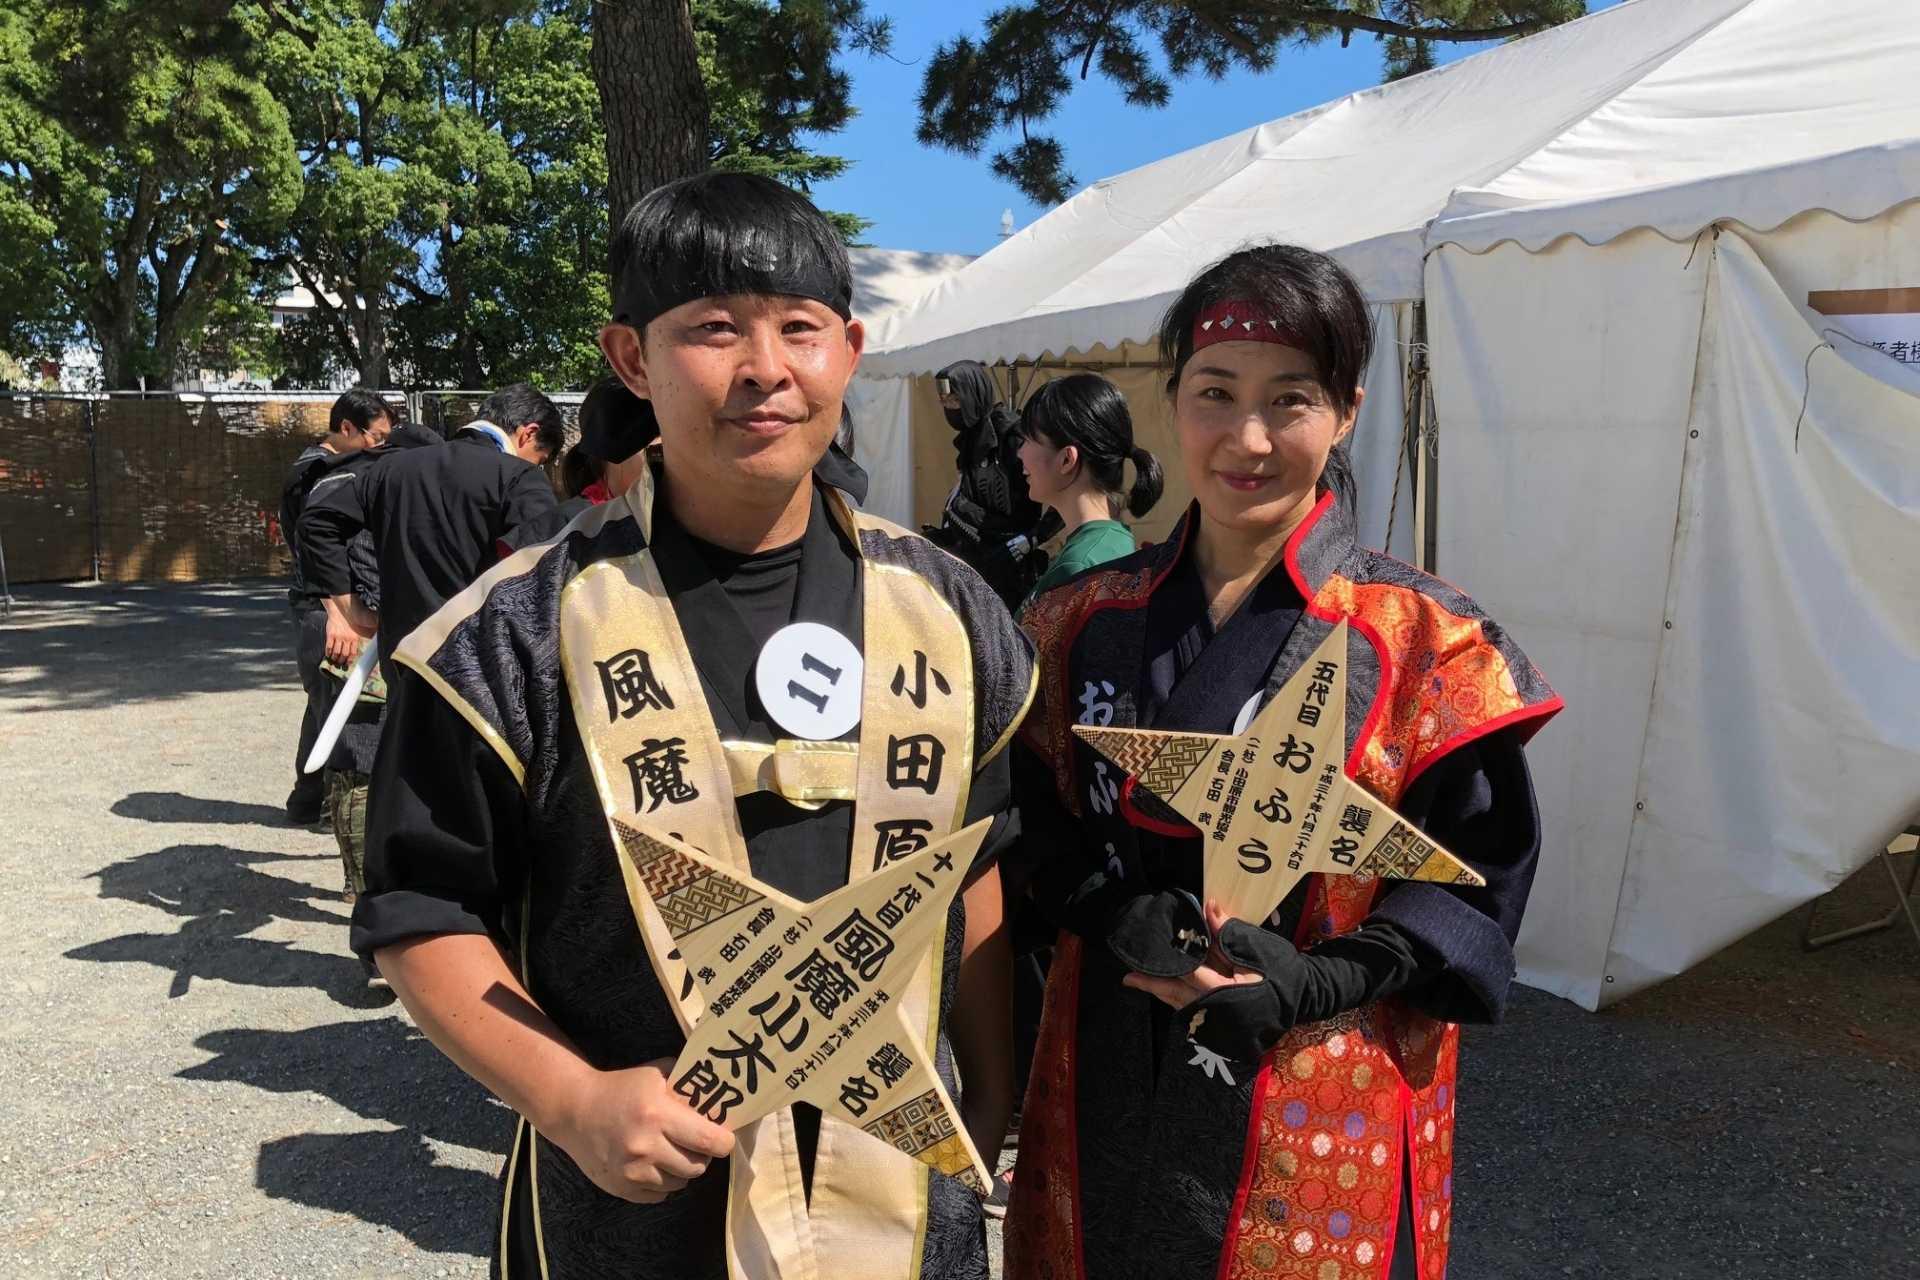 The sixth world one ninja deciding match champion decision